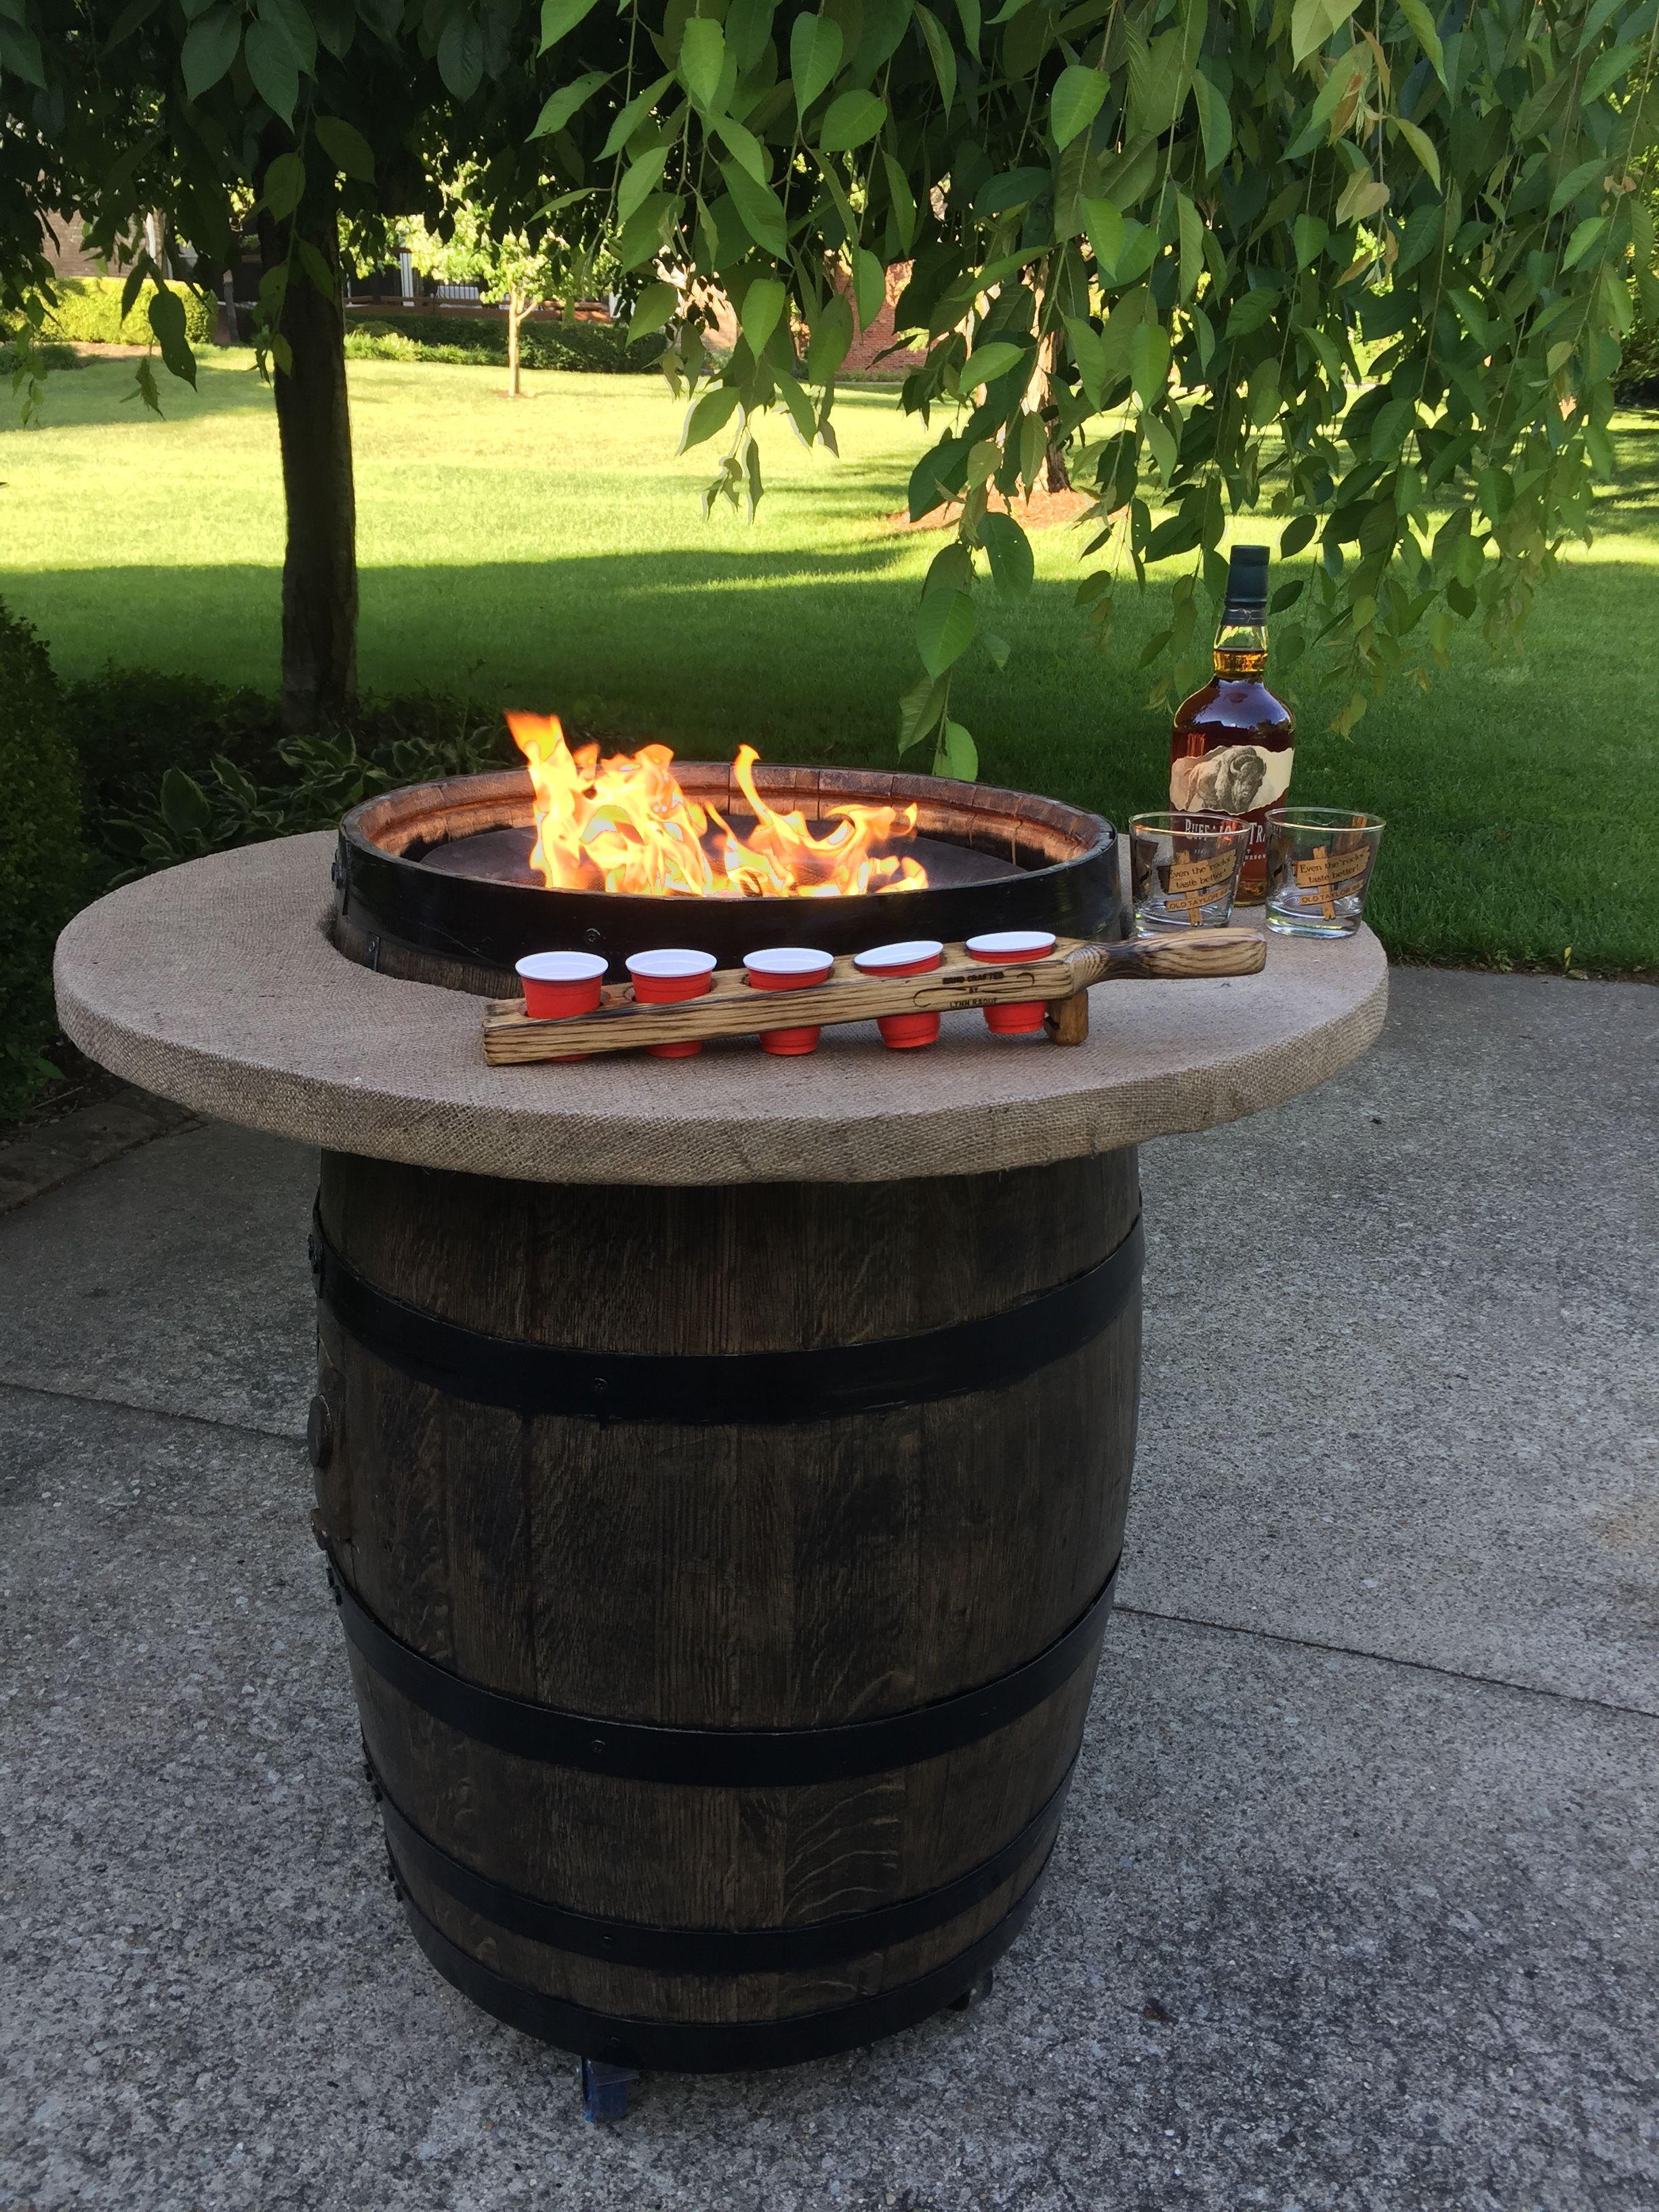 Bourbon barrel propane fire pit whiskey barrel whiskey